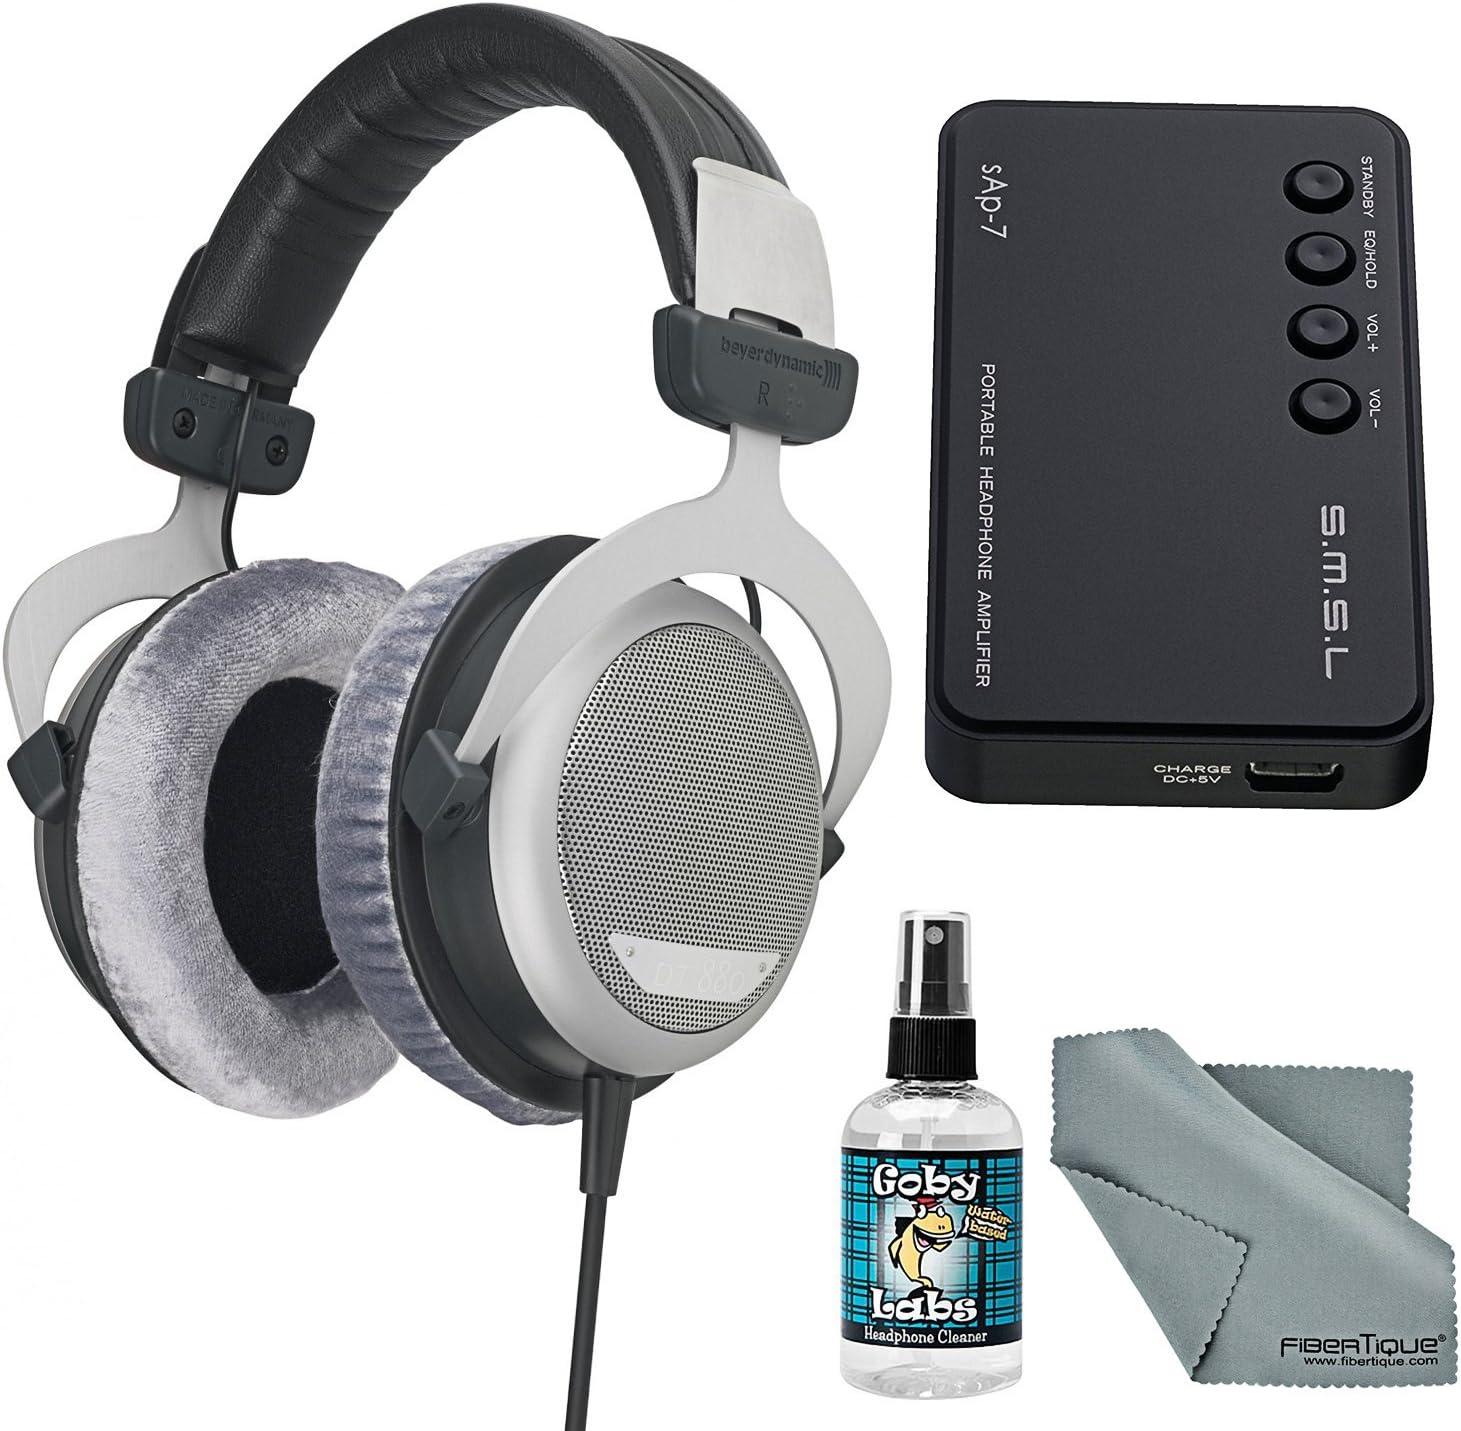 BEYERDYNAMIC DT880 프리미엄 250 옴 헤드폰 앰프+클리너+FIBERTIQUE 천 번들